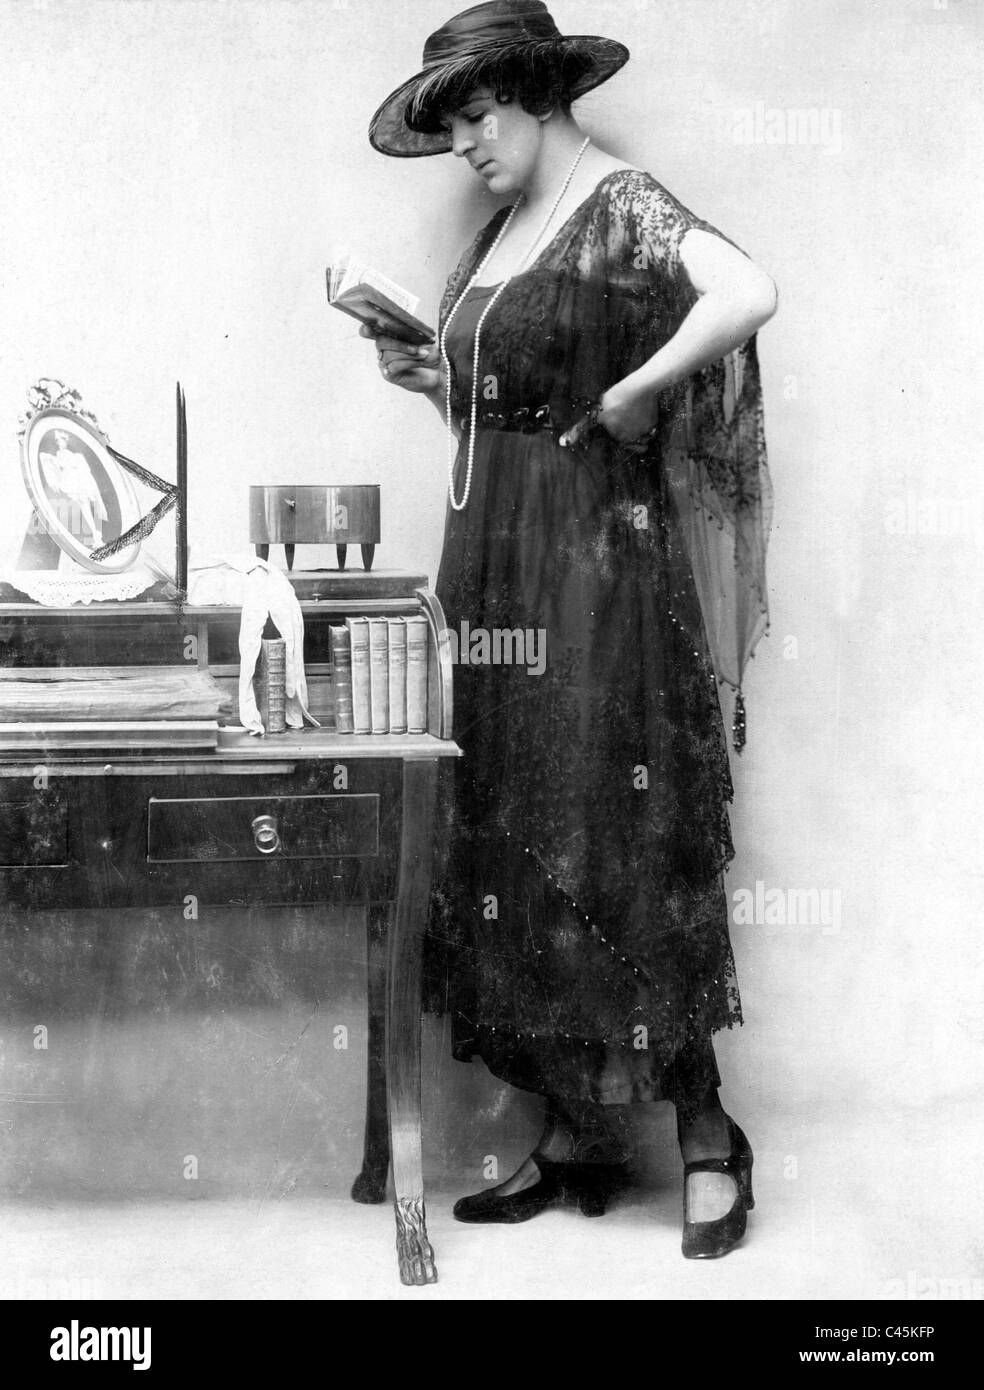 Women's Fashion For 1919 Stock Photo: 37004458